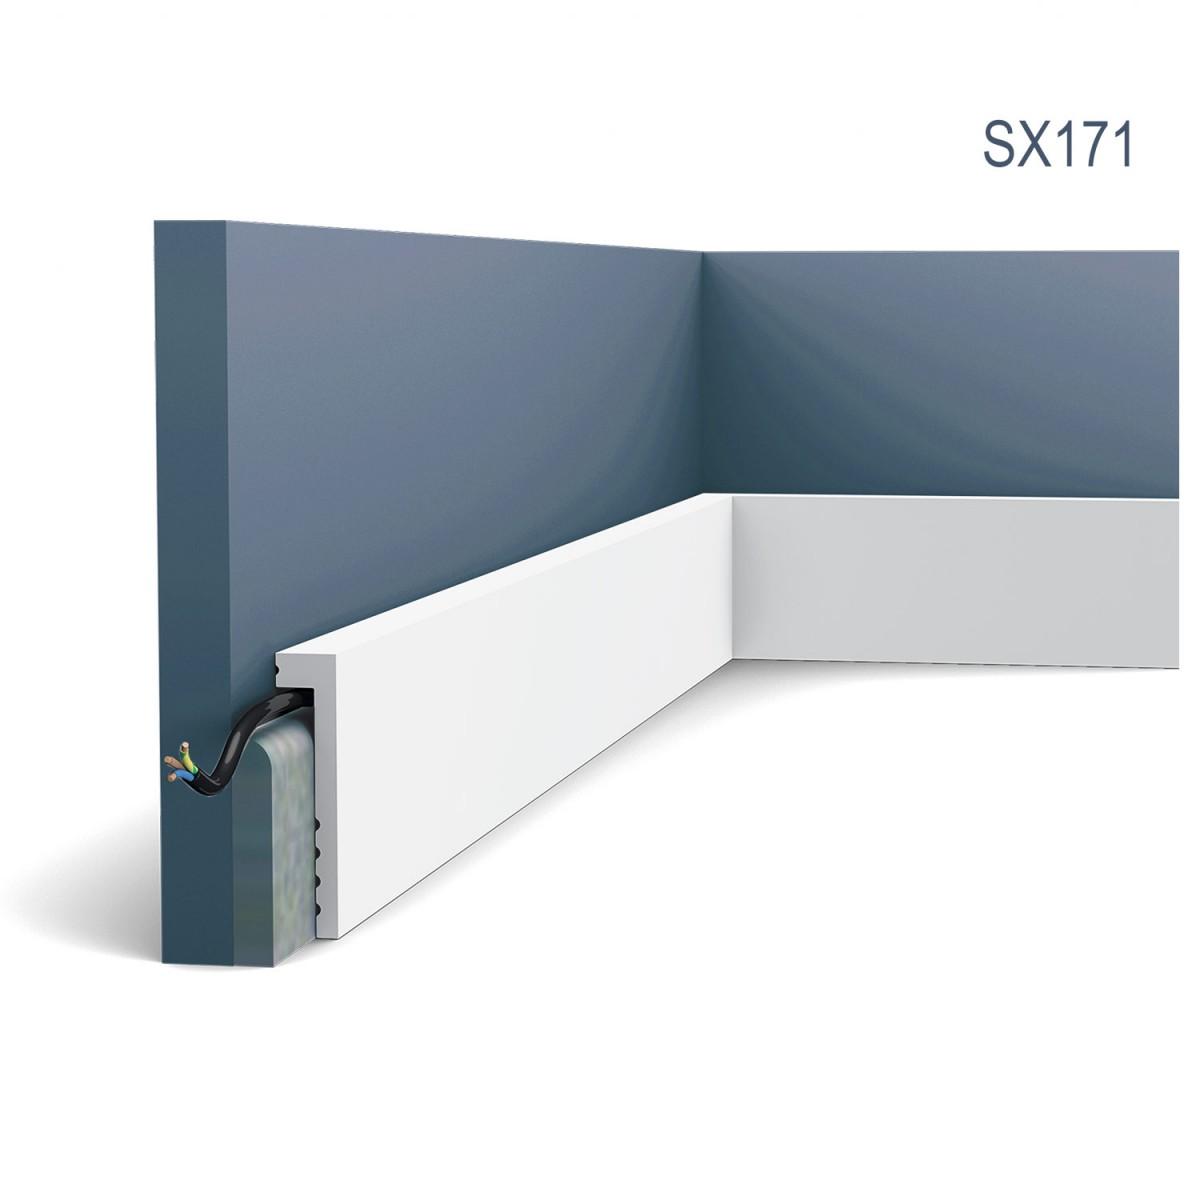 Plinta Axxent SX171, Dimensiuni: 200 X 10 X 2.2 cm, Orac Decor